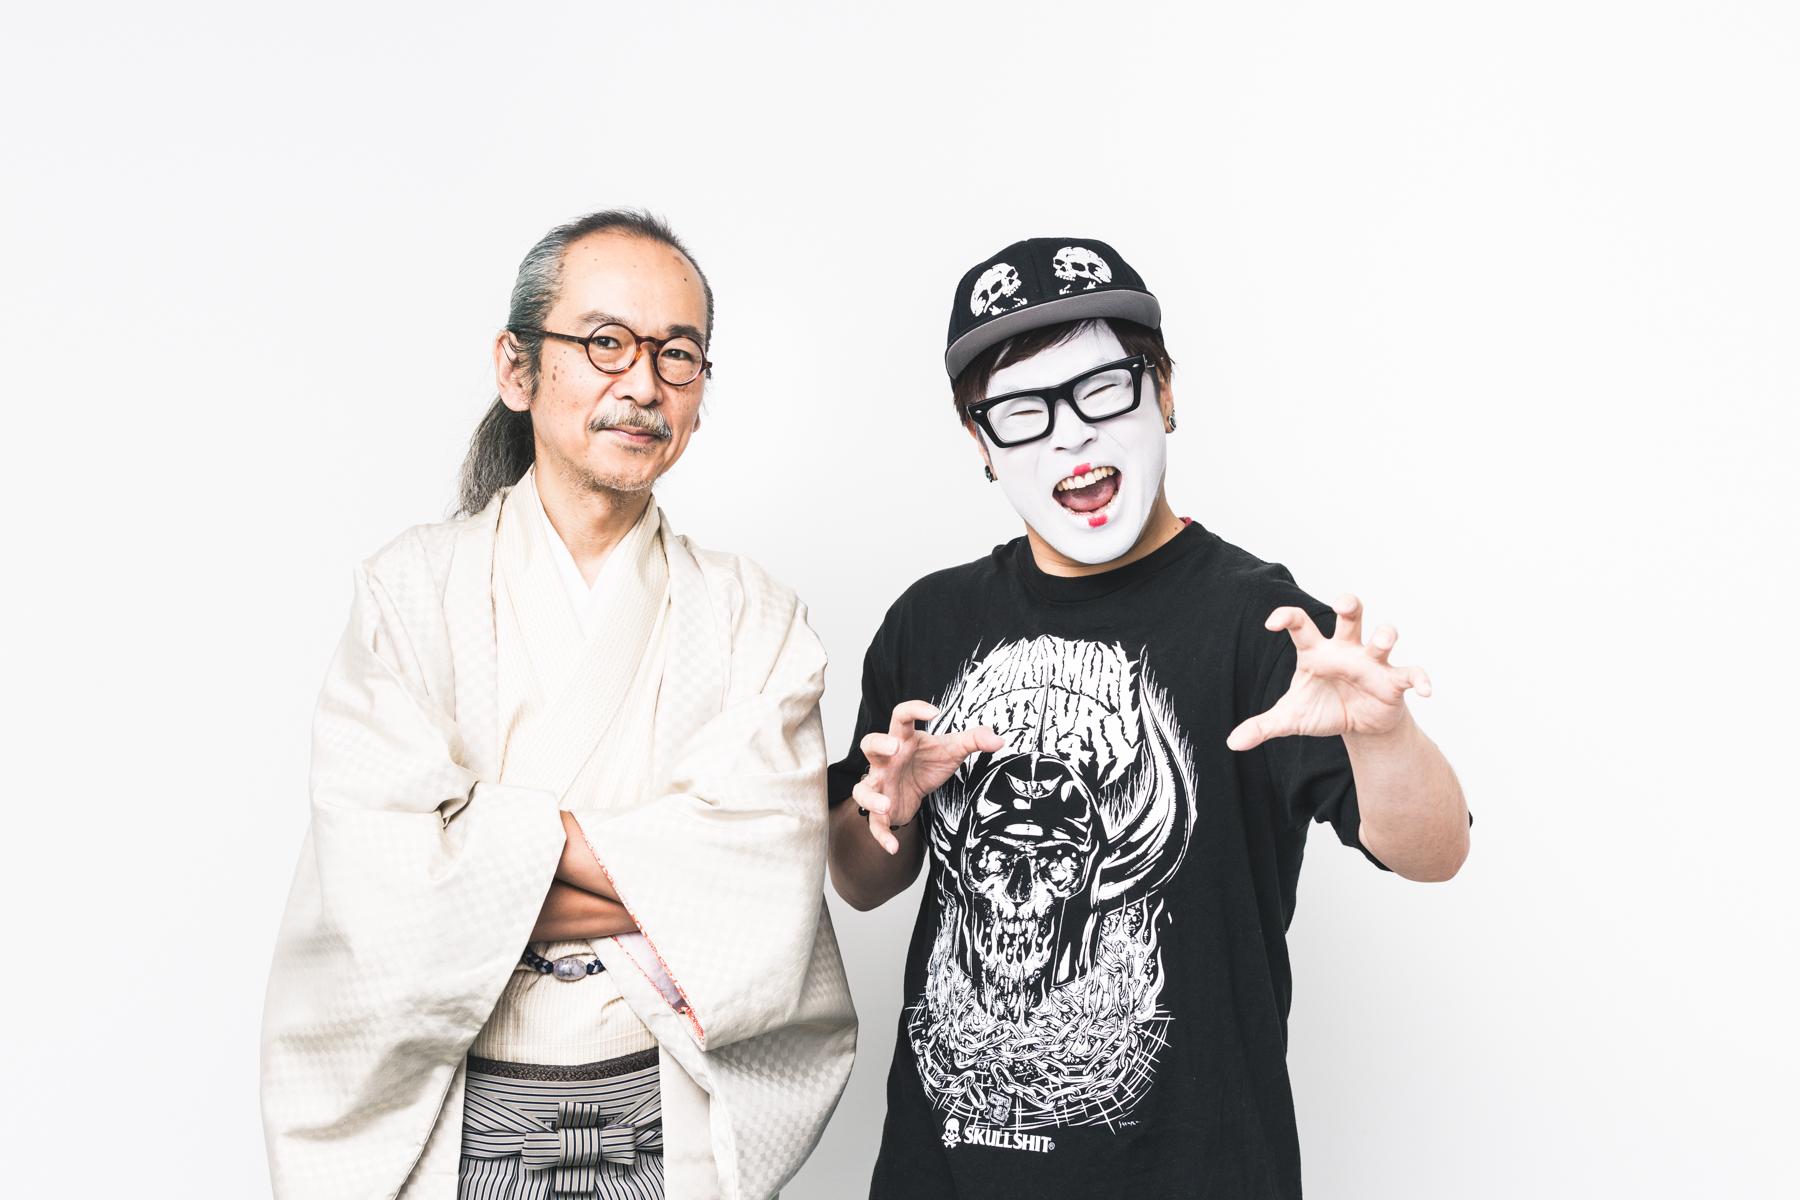 和嶋慎治(人間椅子)×団長(NoGoD)